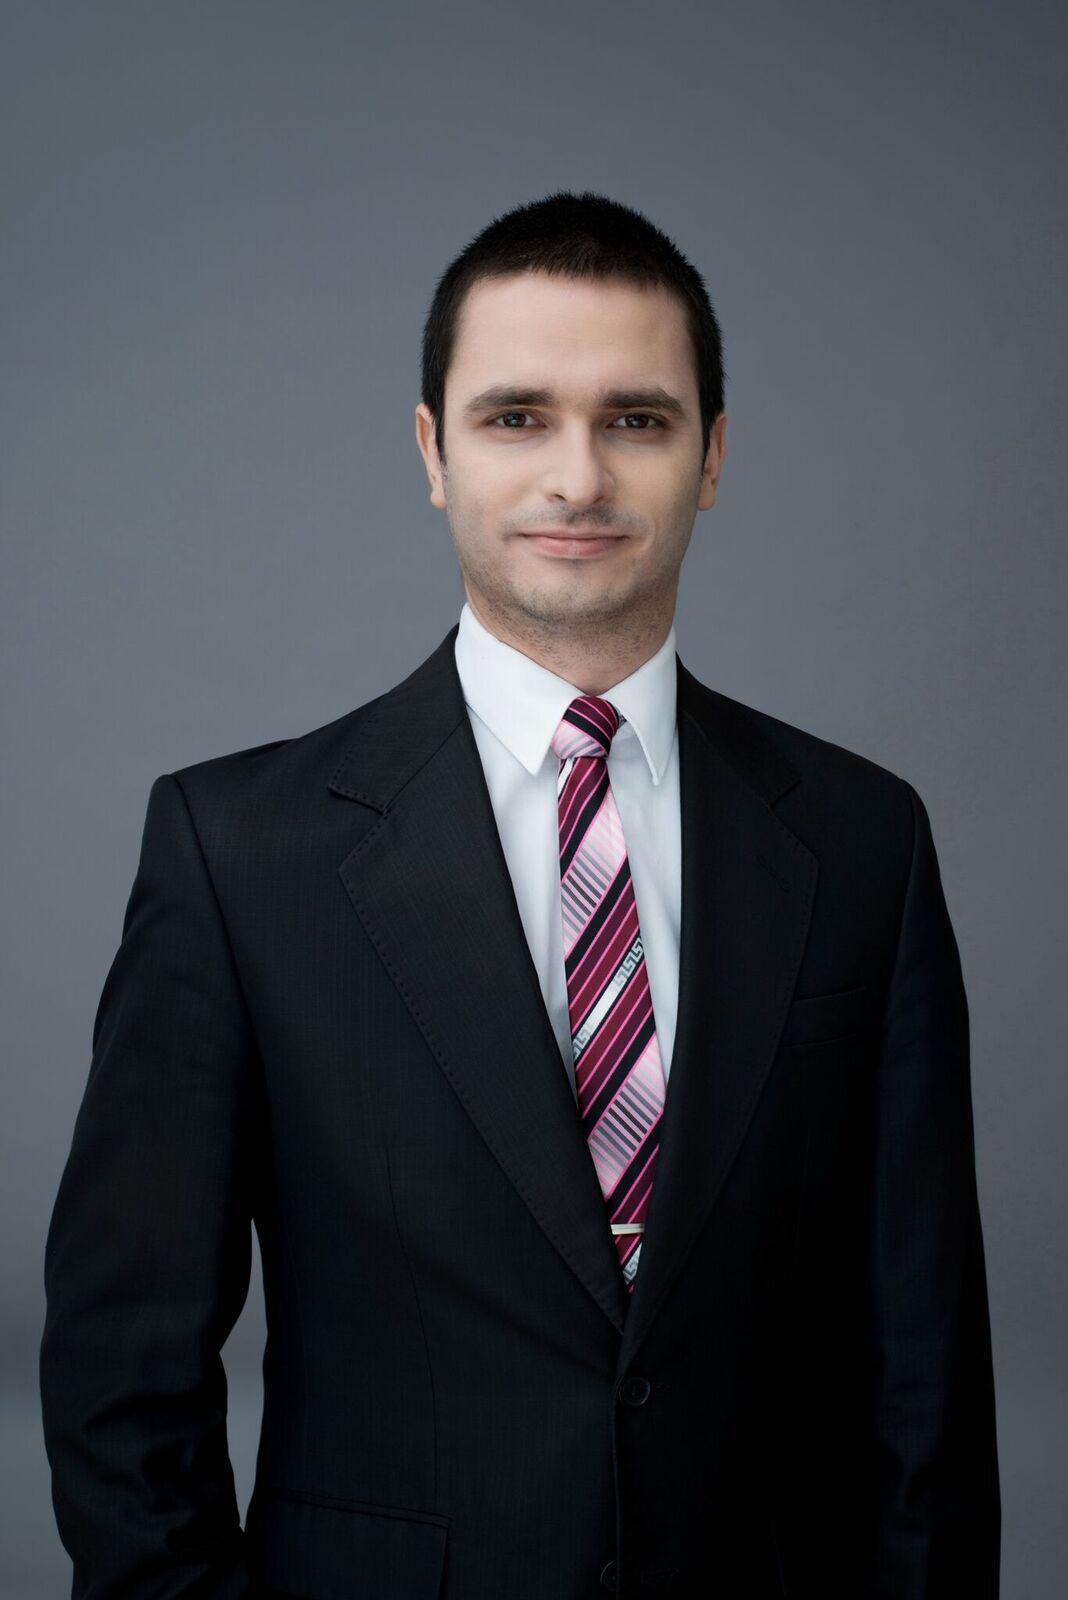 Tomasz Karlikowski